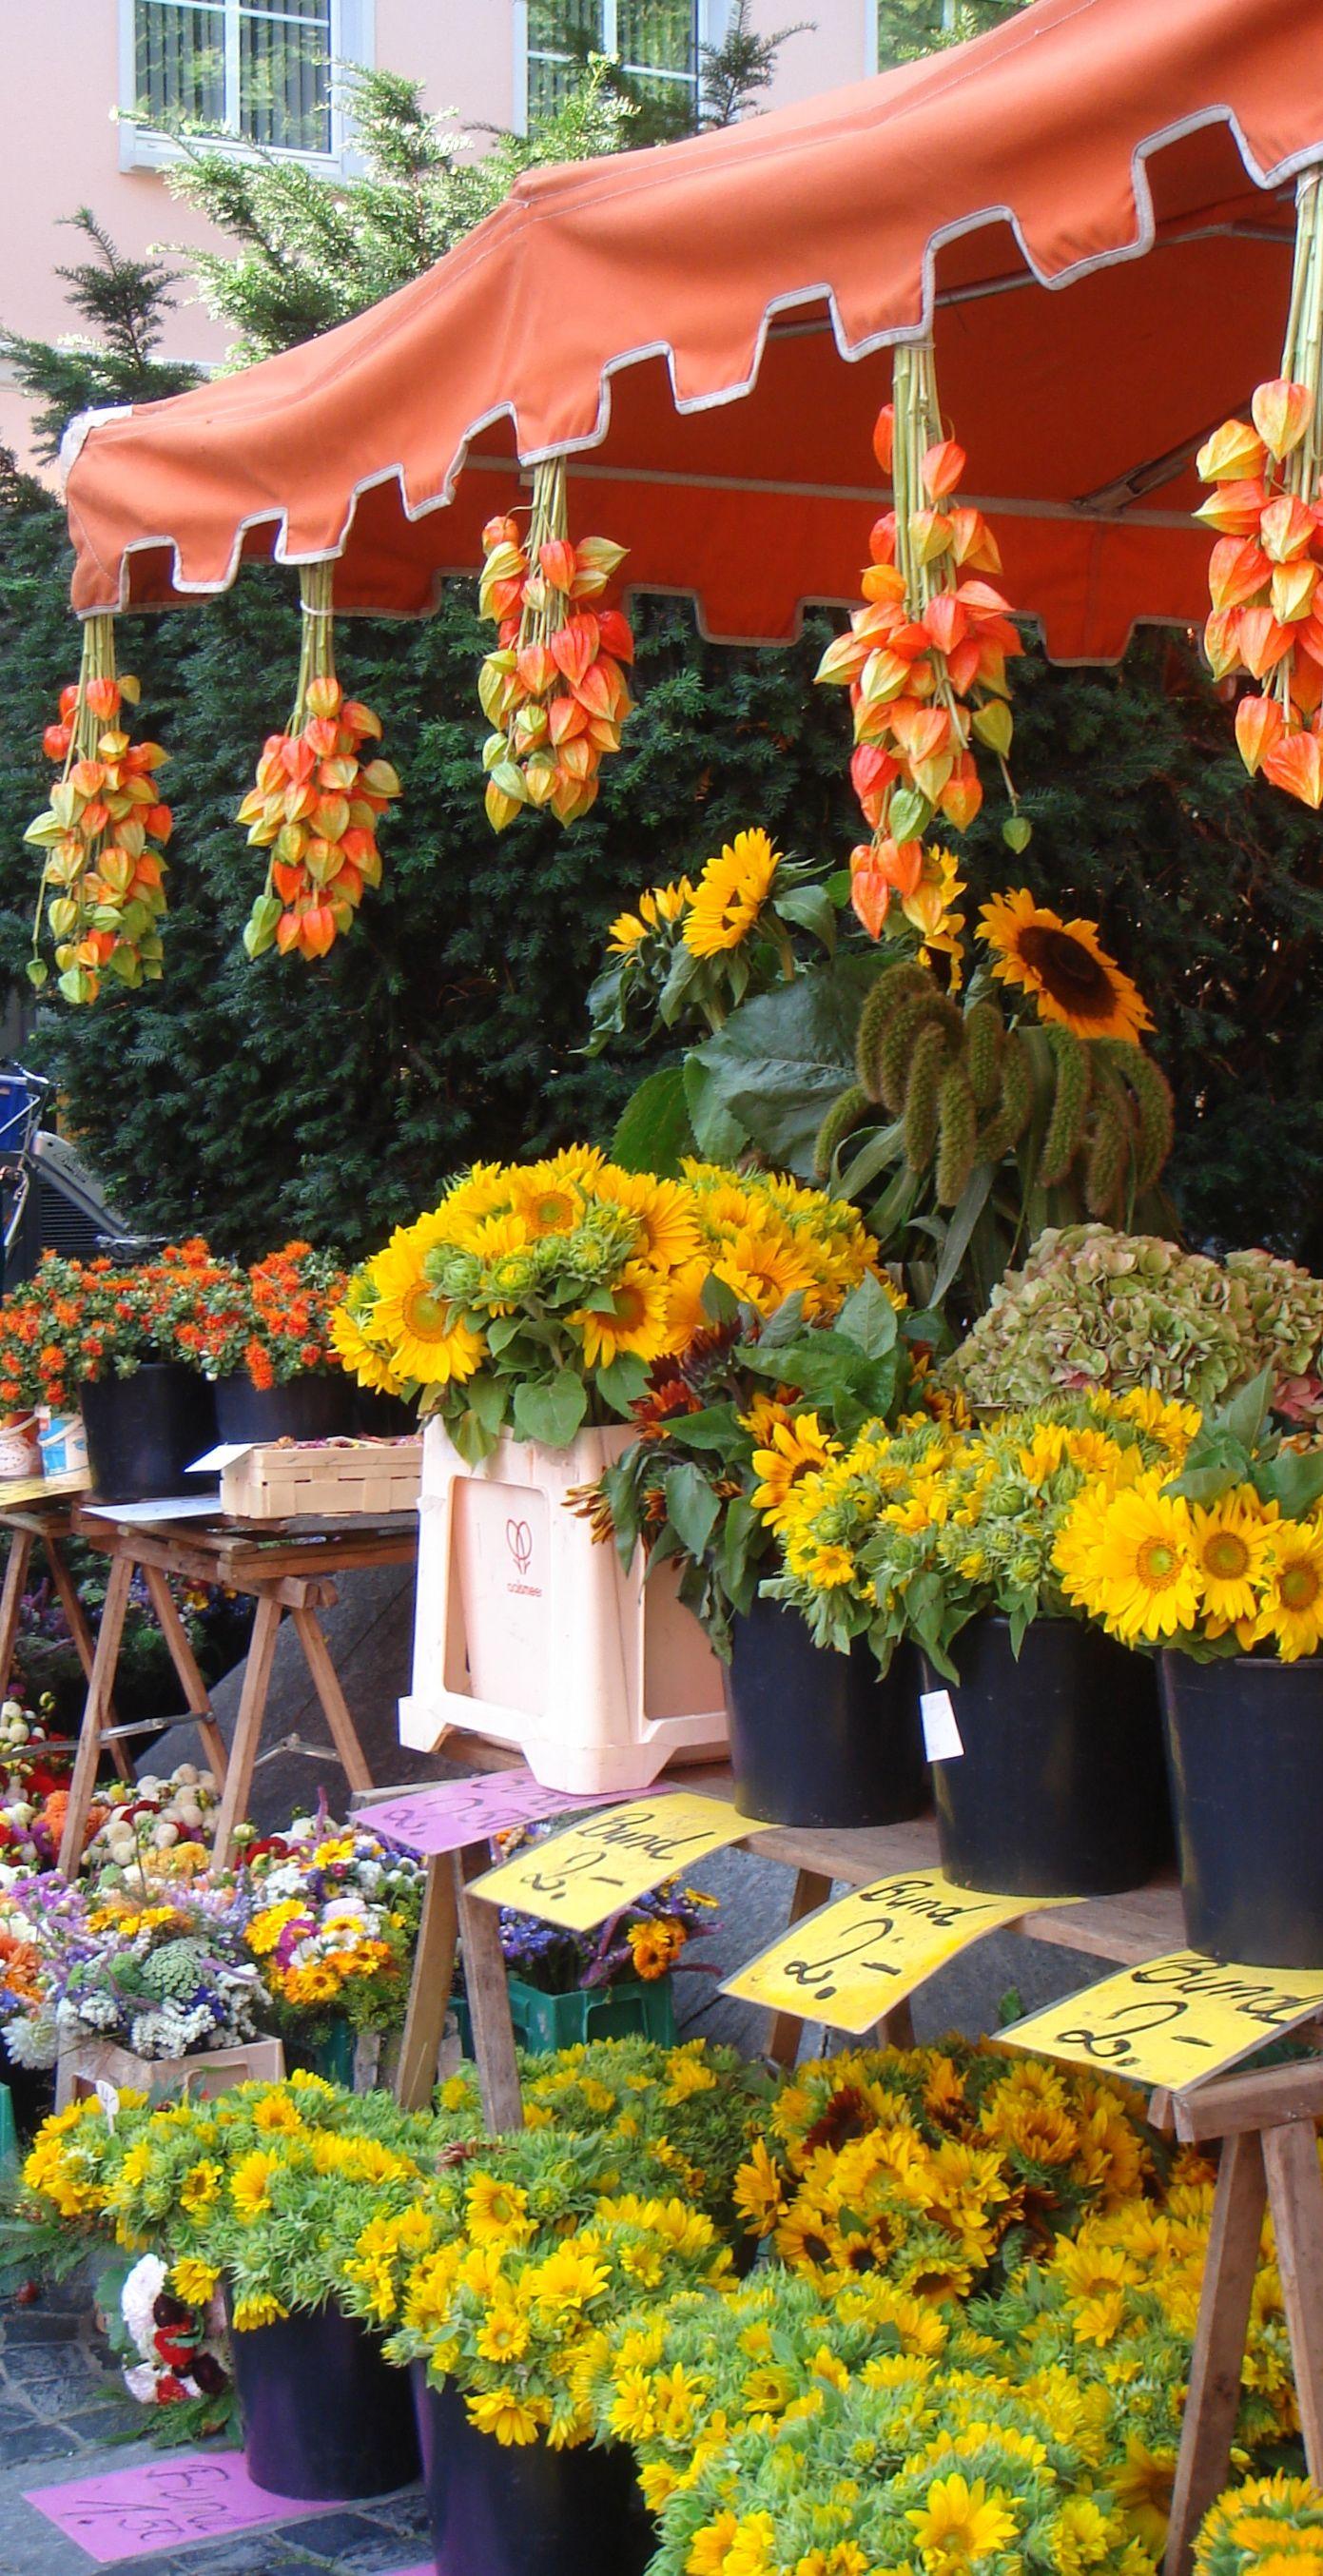 Flower Seller in openair market. Mainz, Germany http